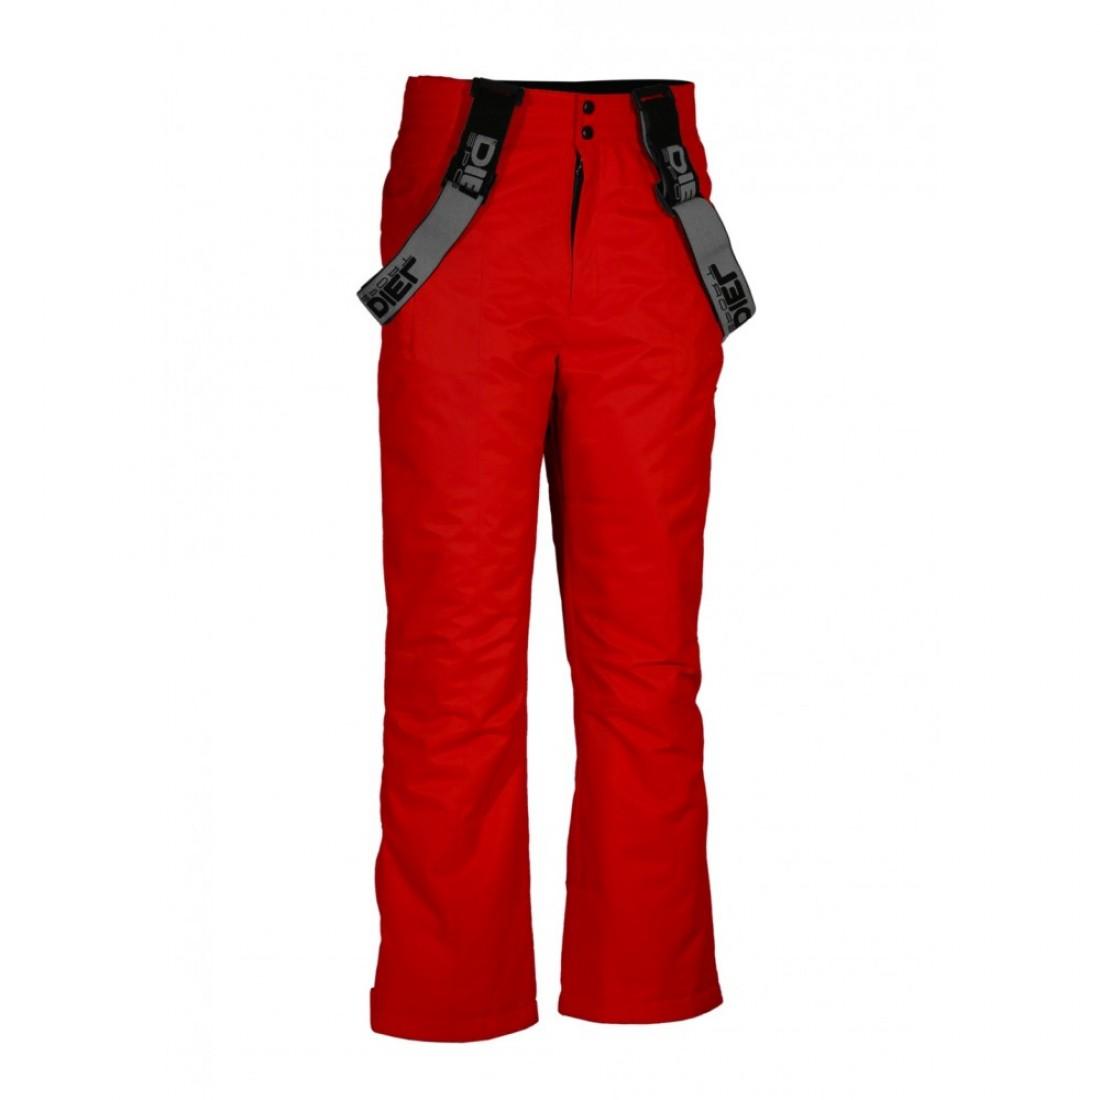 6d9540e7d35 DIEL SPORT EDDY 38548 red Юношеско долнище - ДИЕЛ СПОРТ колекция ALPINE